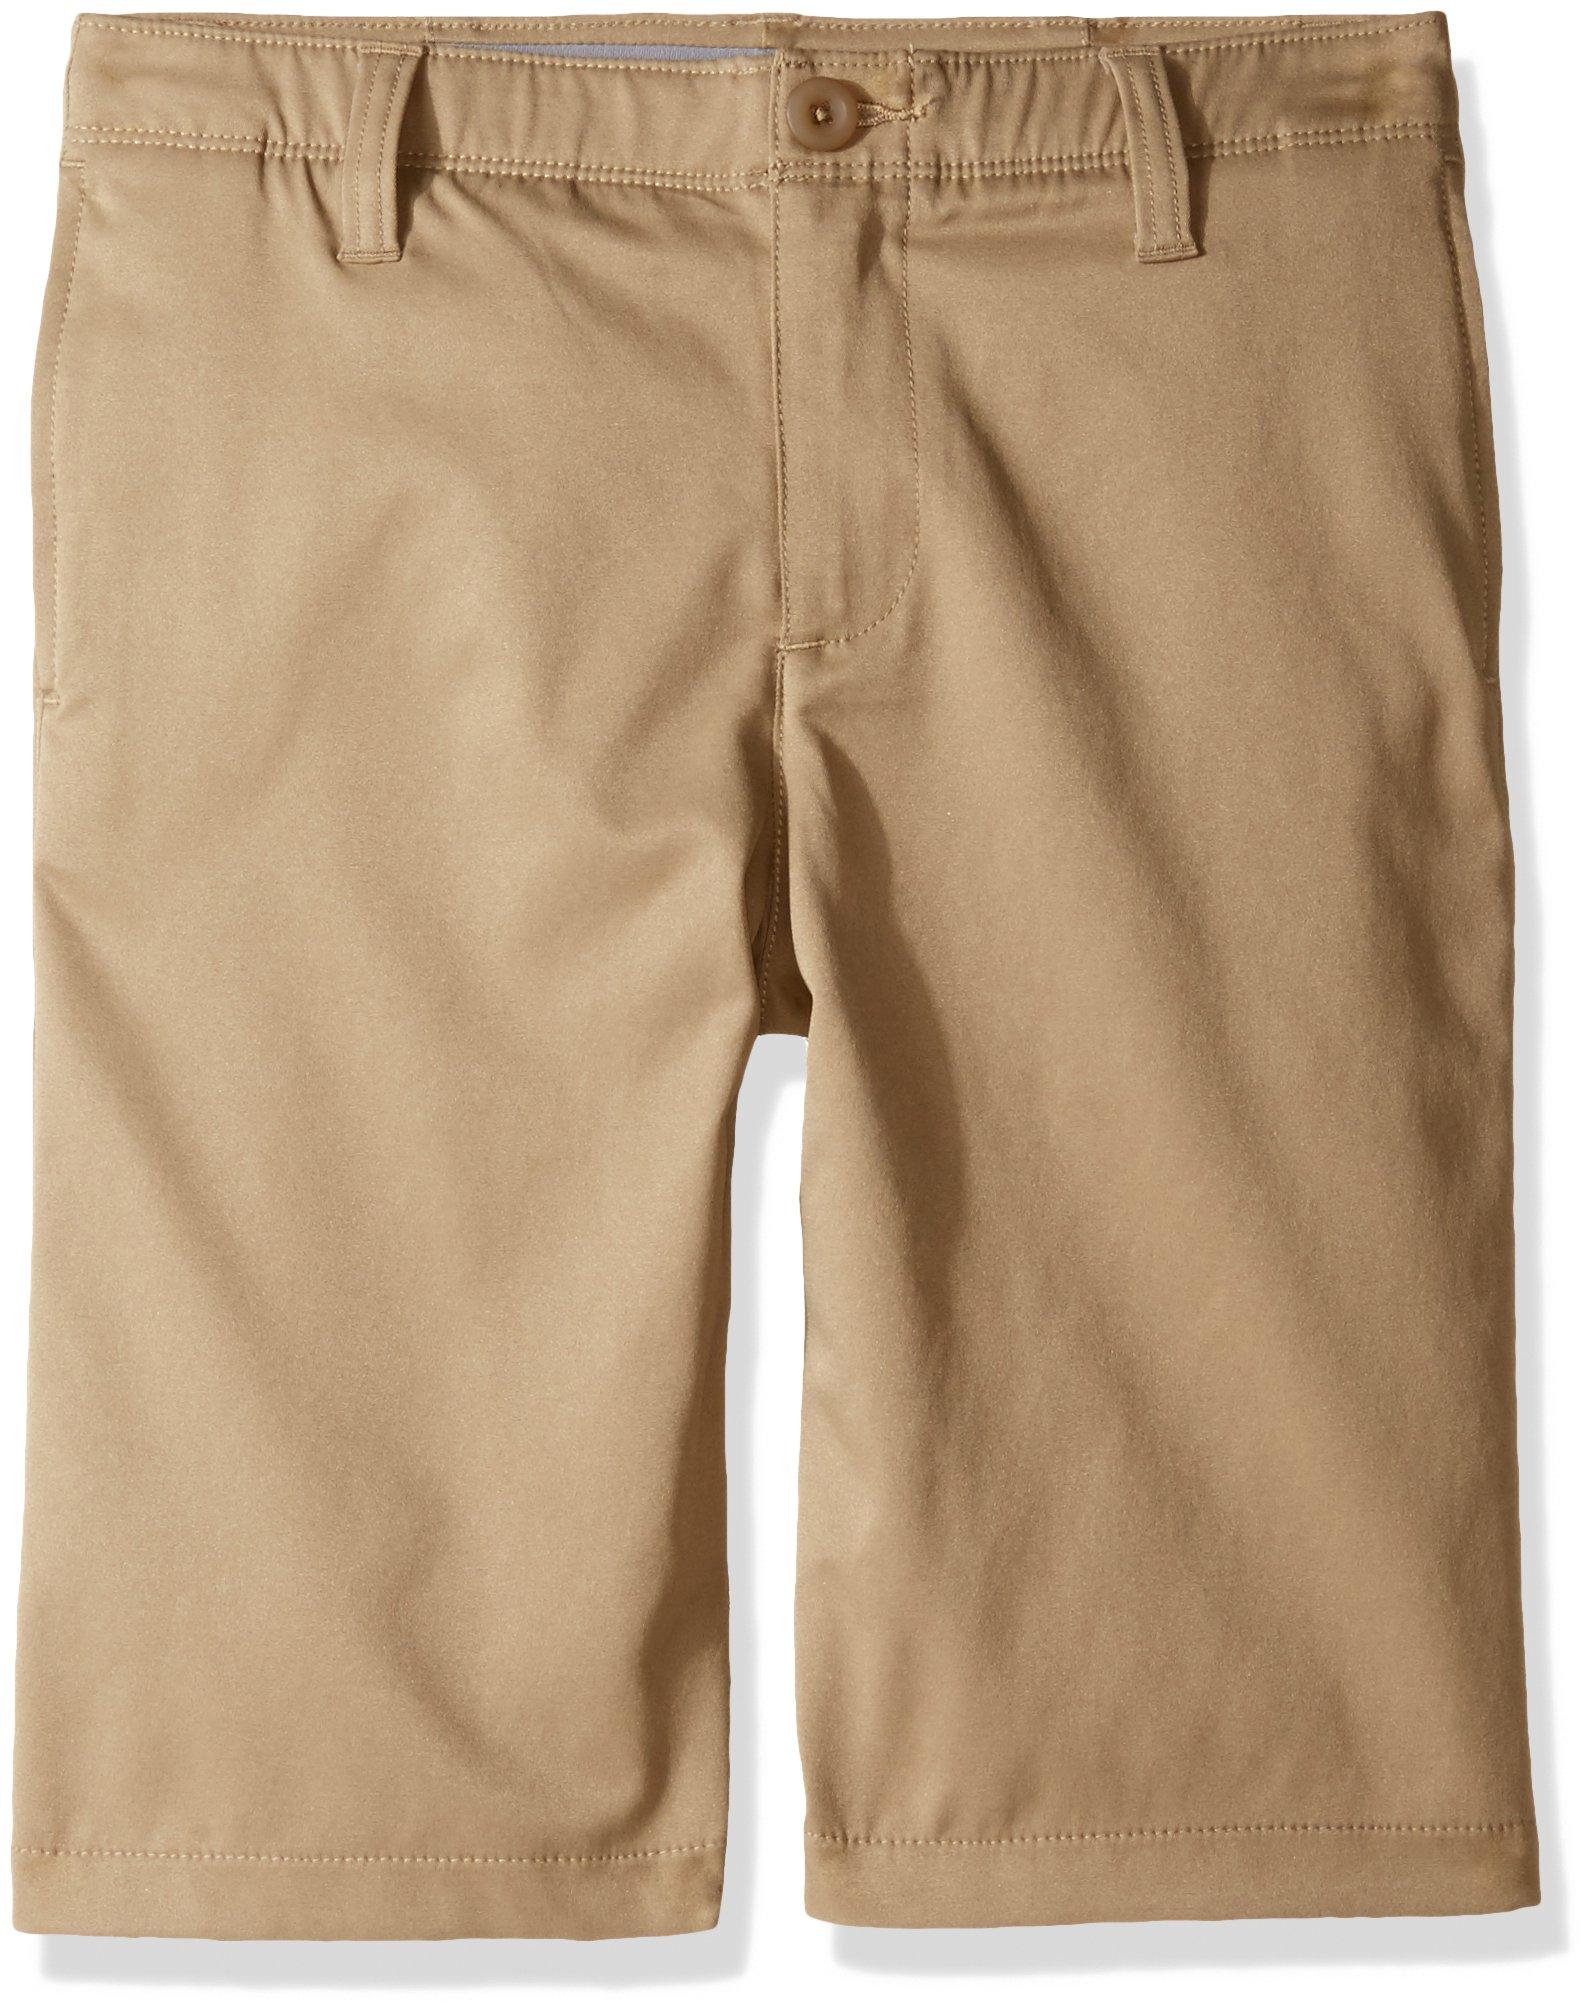 Under Armour Boys' Match Play Polo Shorts,Canvas/Canvas,20 by Under Armour